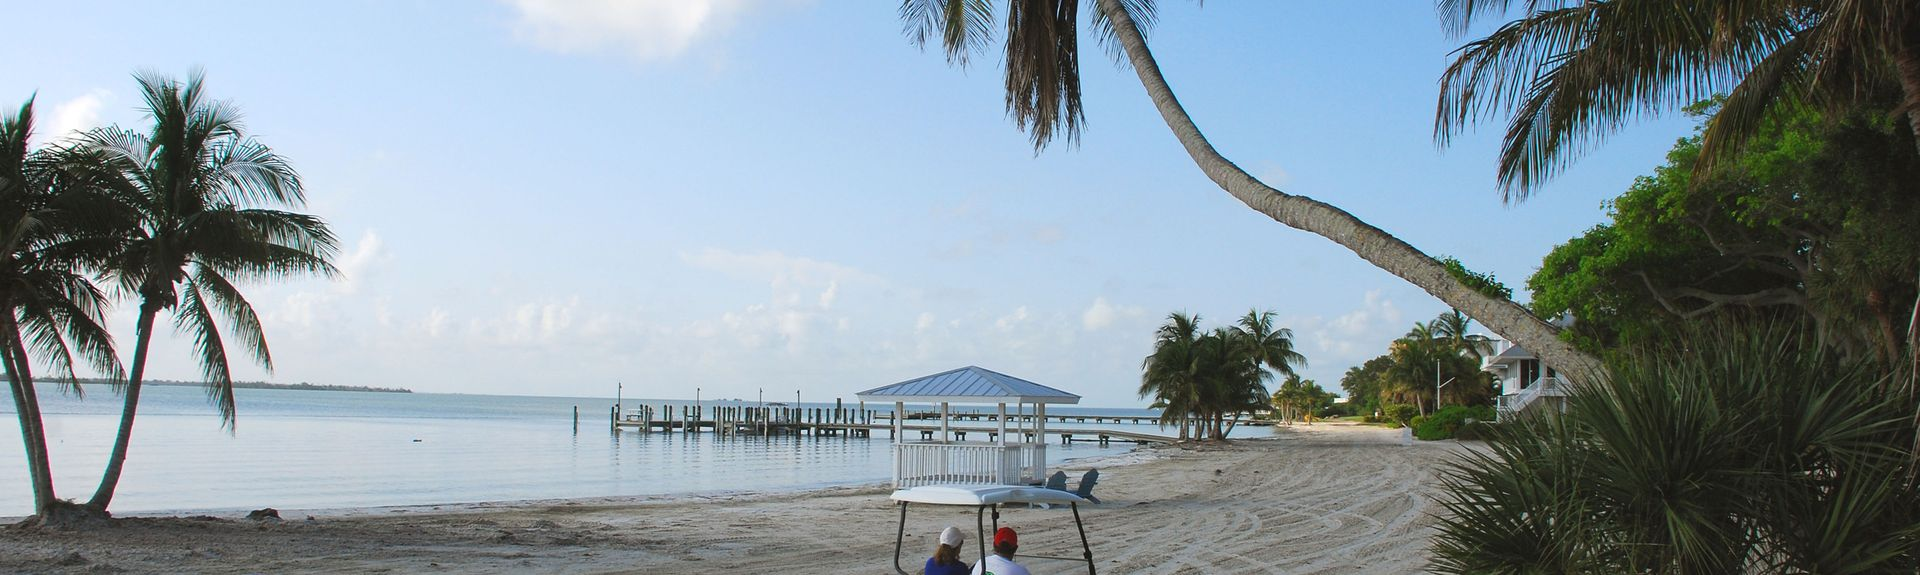 Useppa Island, FL, USA